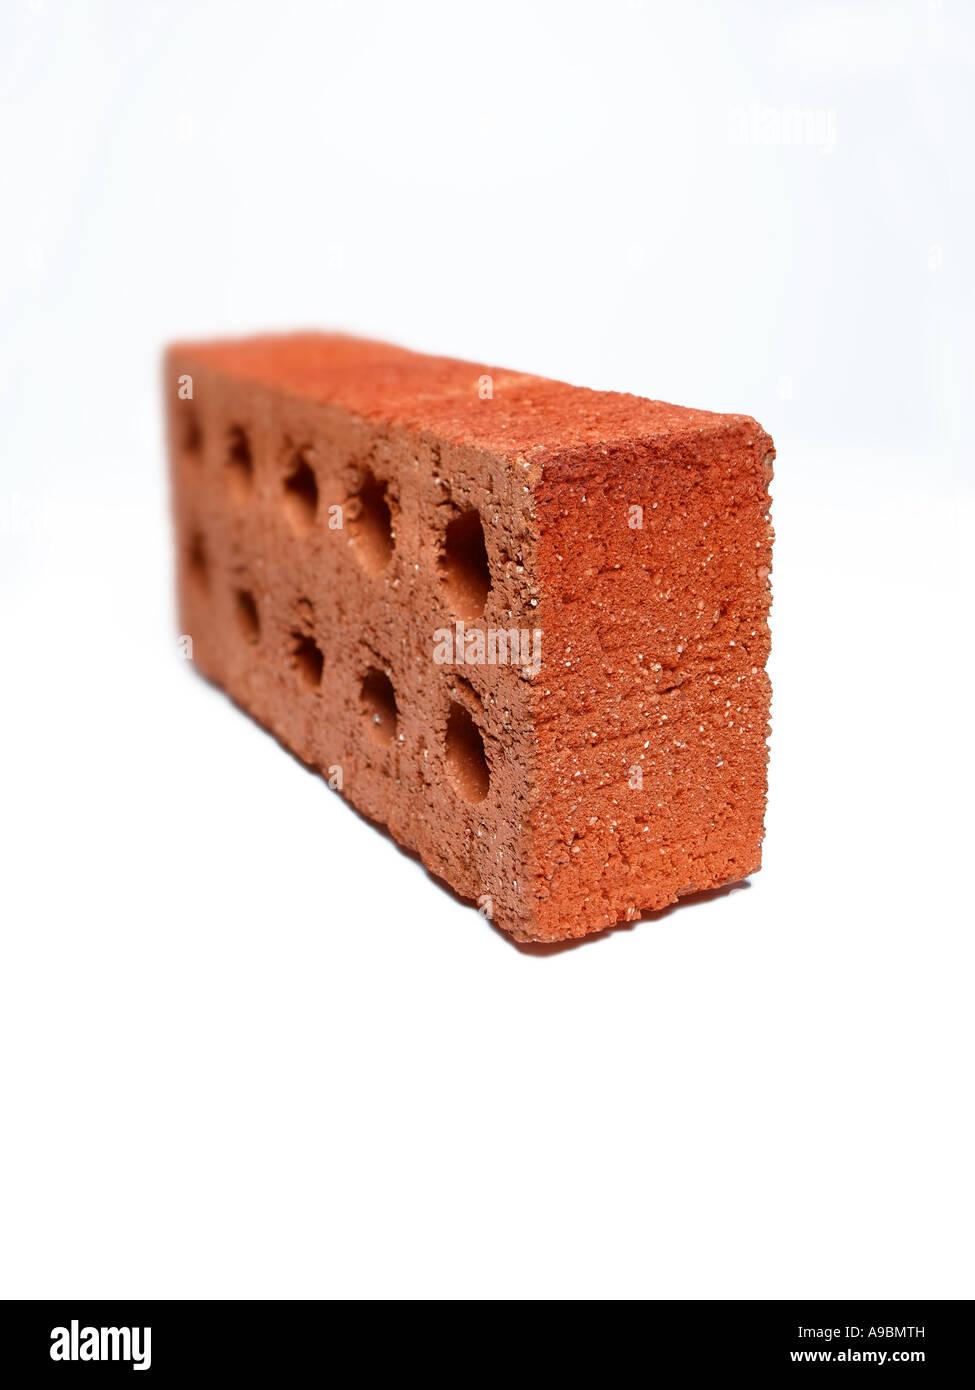 house brick - Stock Image